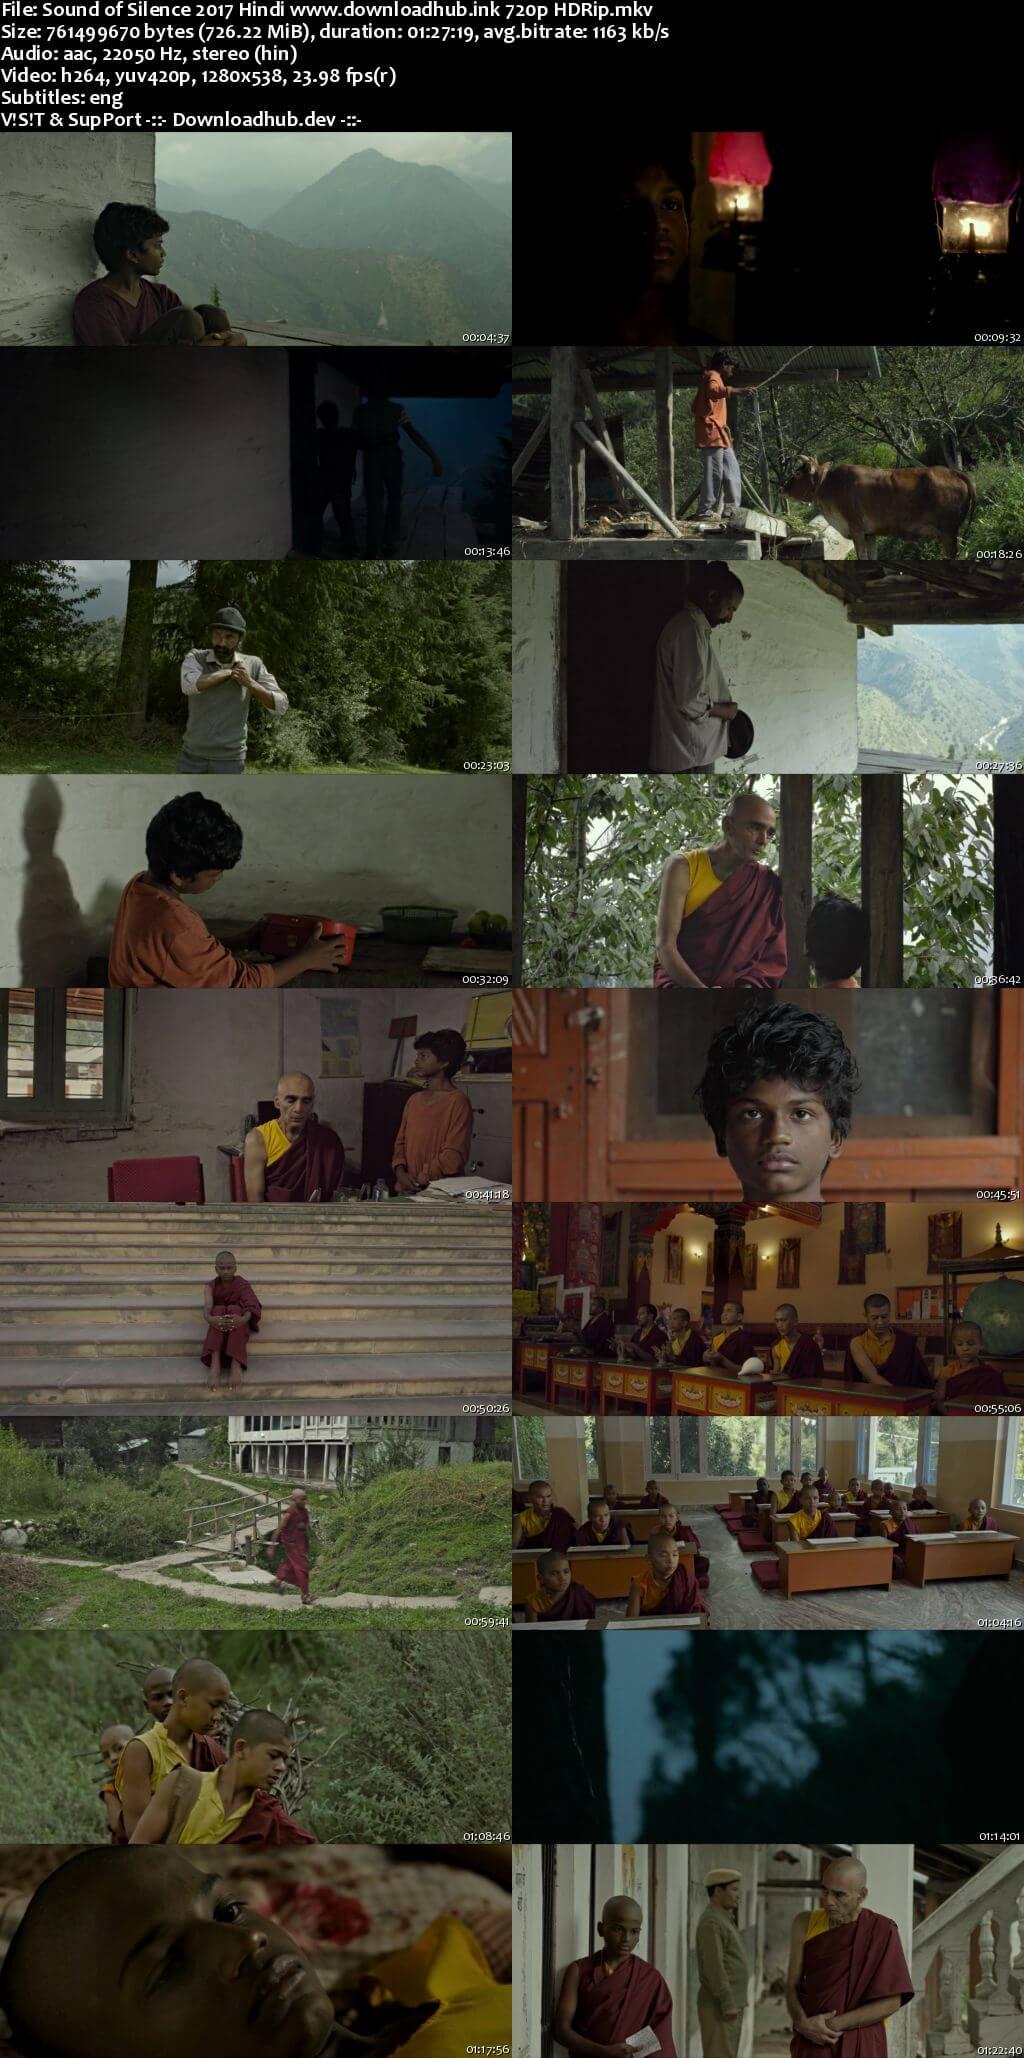 Sound of Silence 2017 Hindi 720p HDRip ESubs